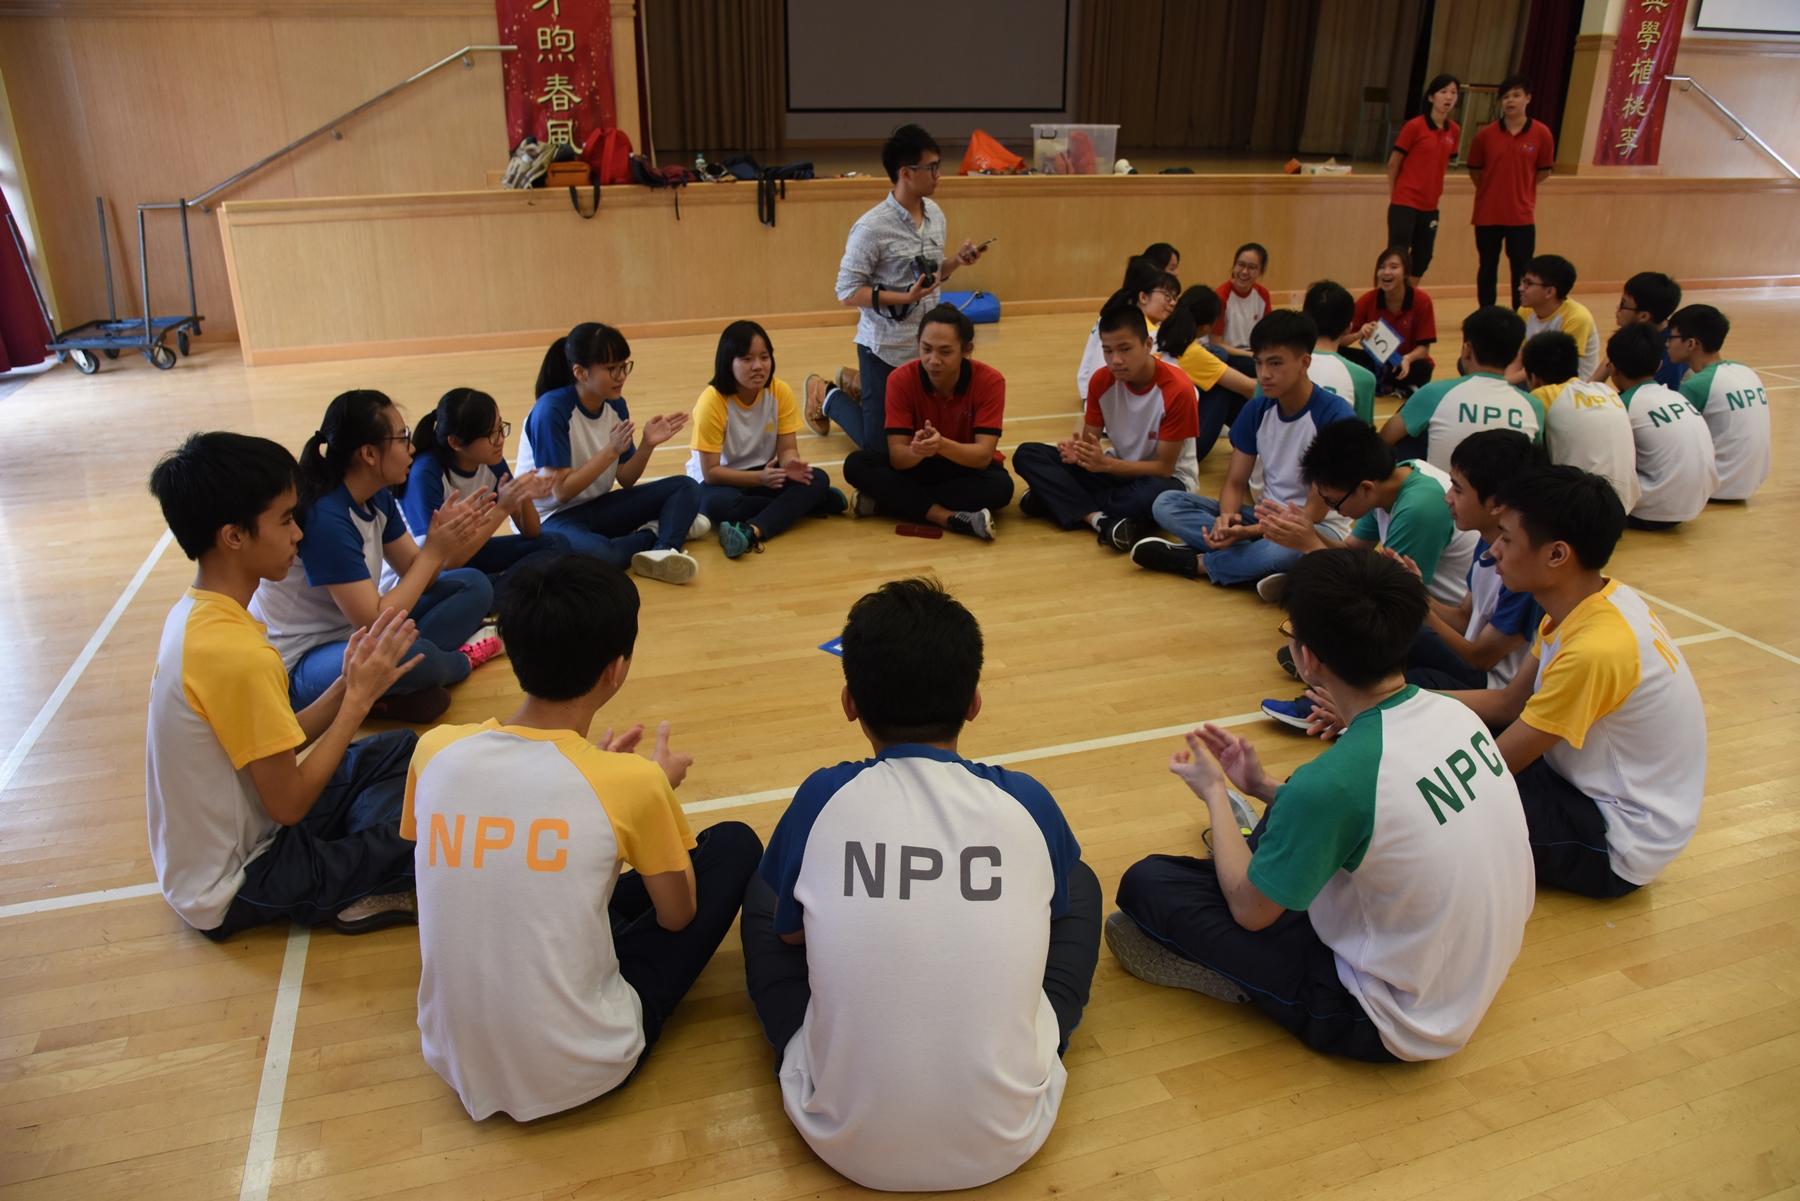 http://npc.edu.hk/sites/default/files/dsc_5880.jpg